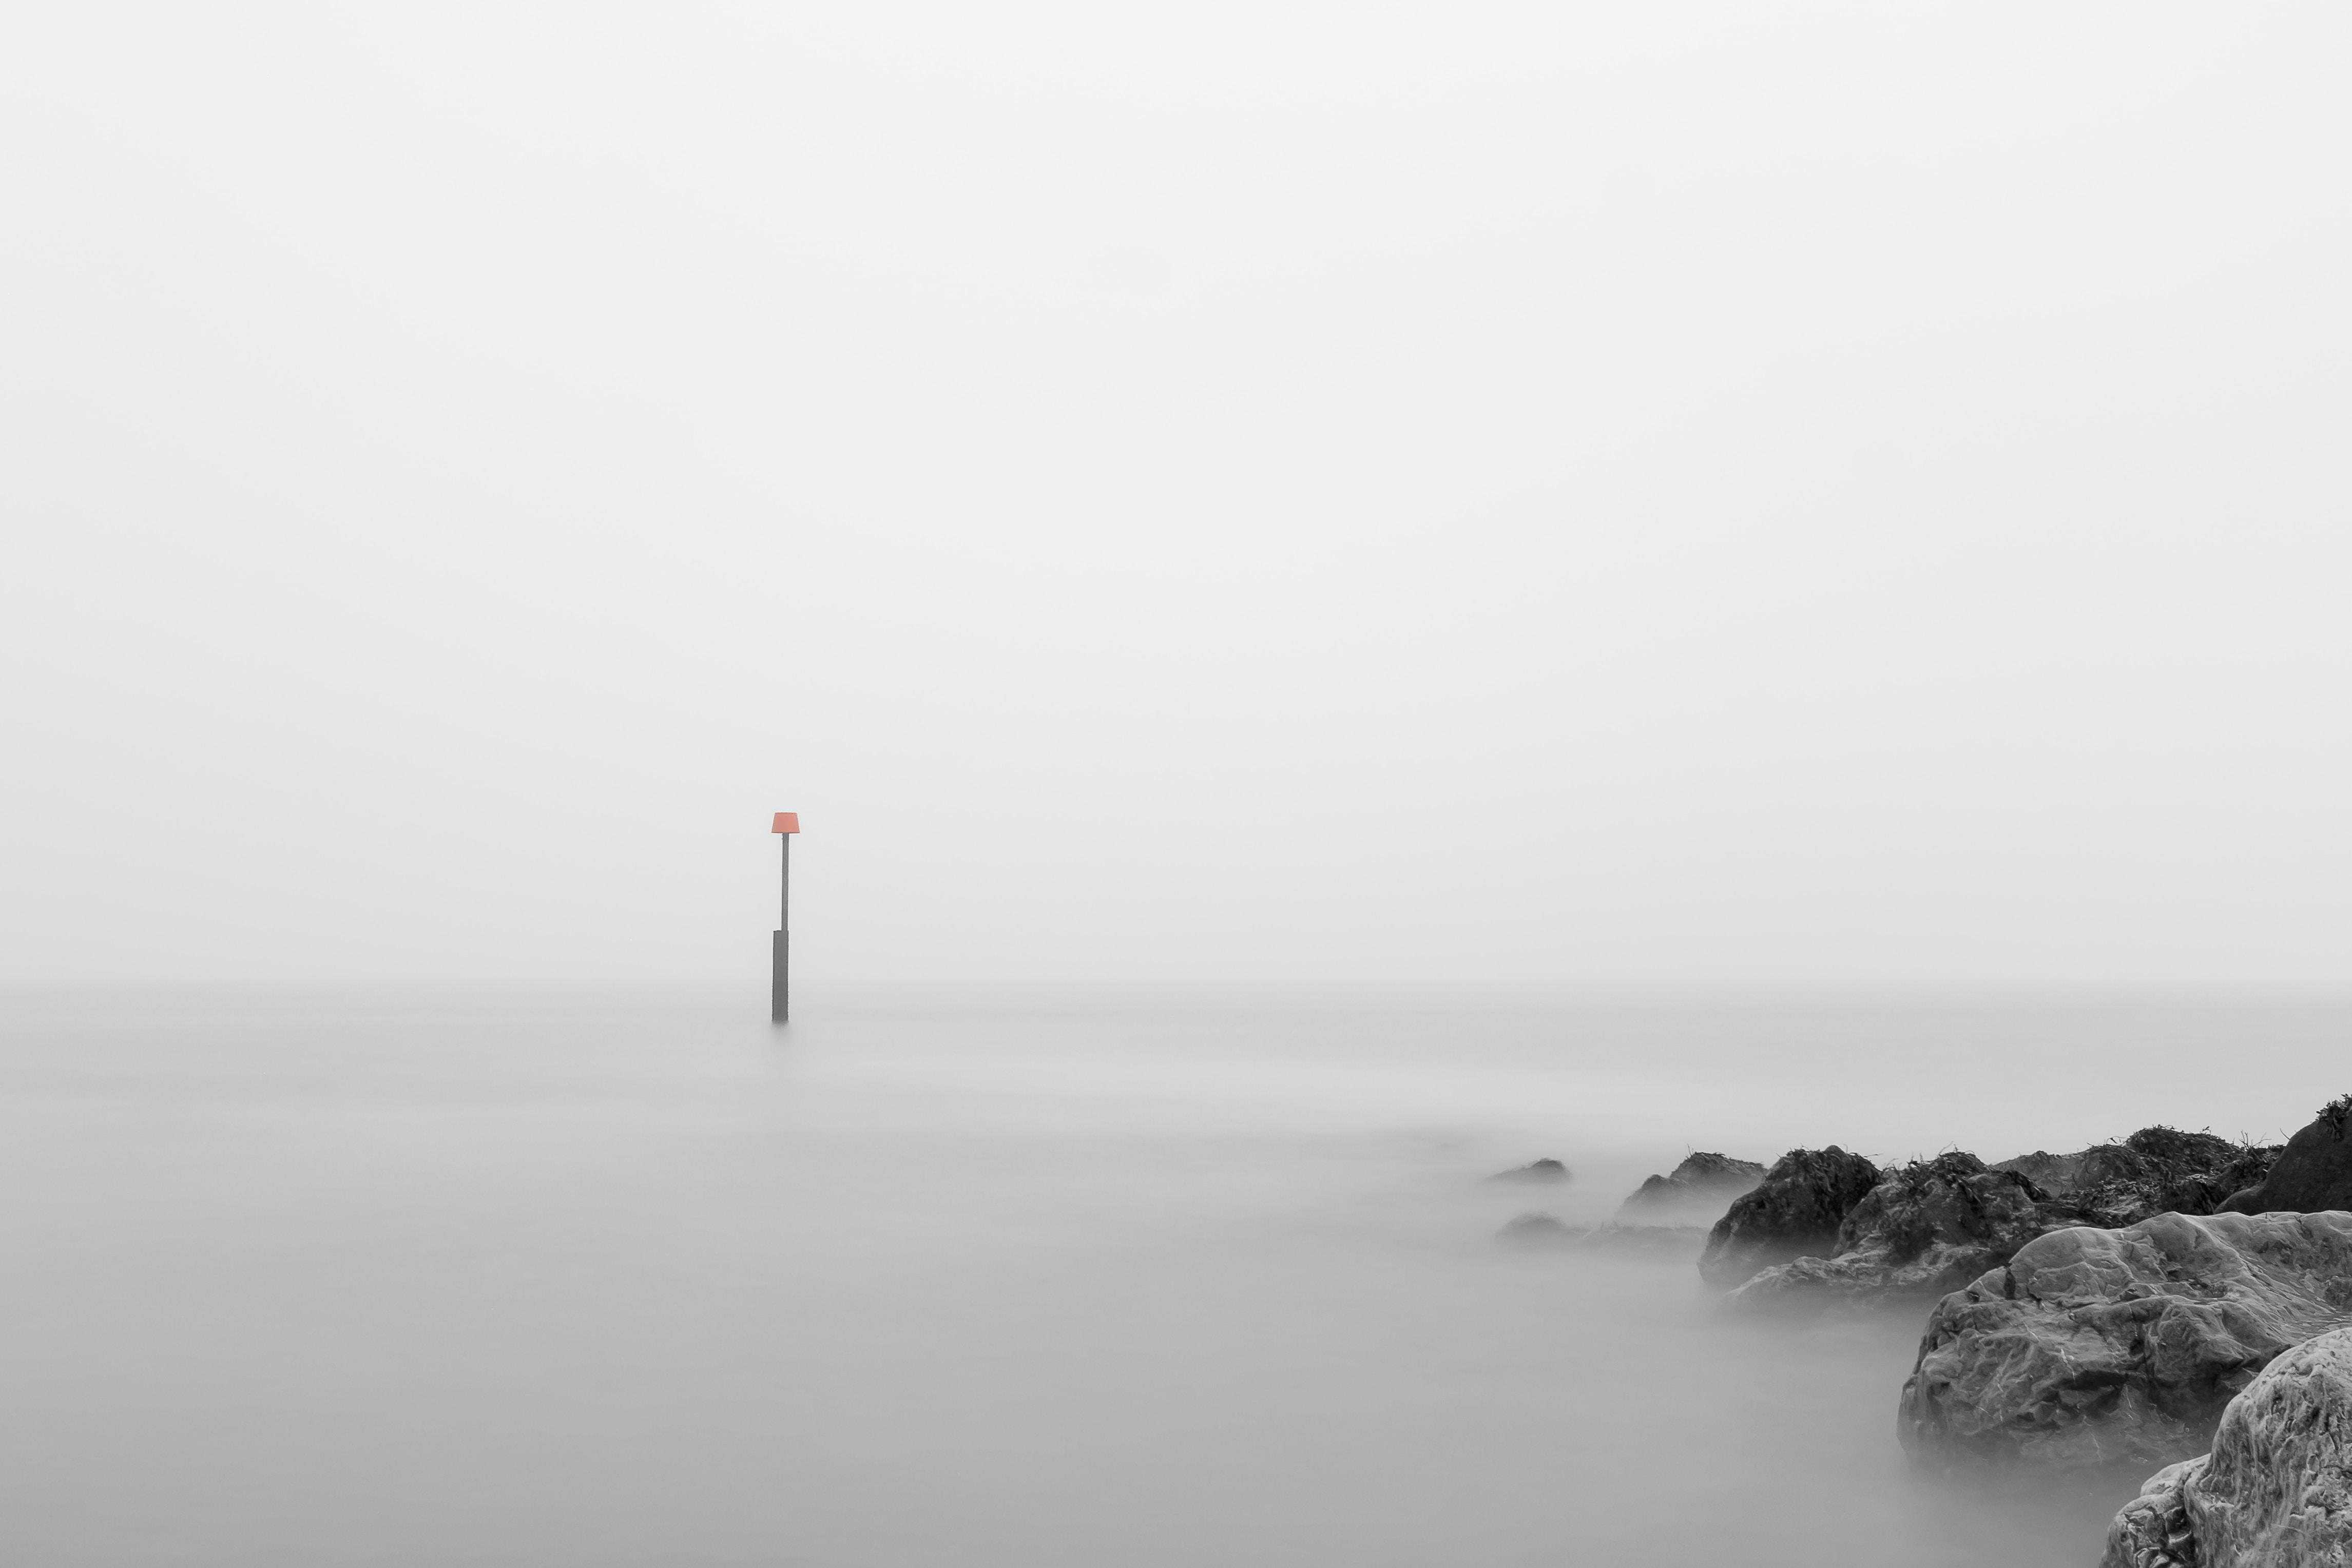 photo of pillar bouy on body of water